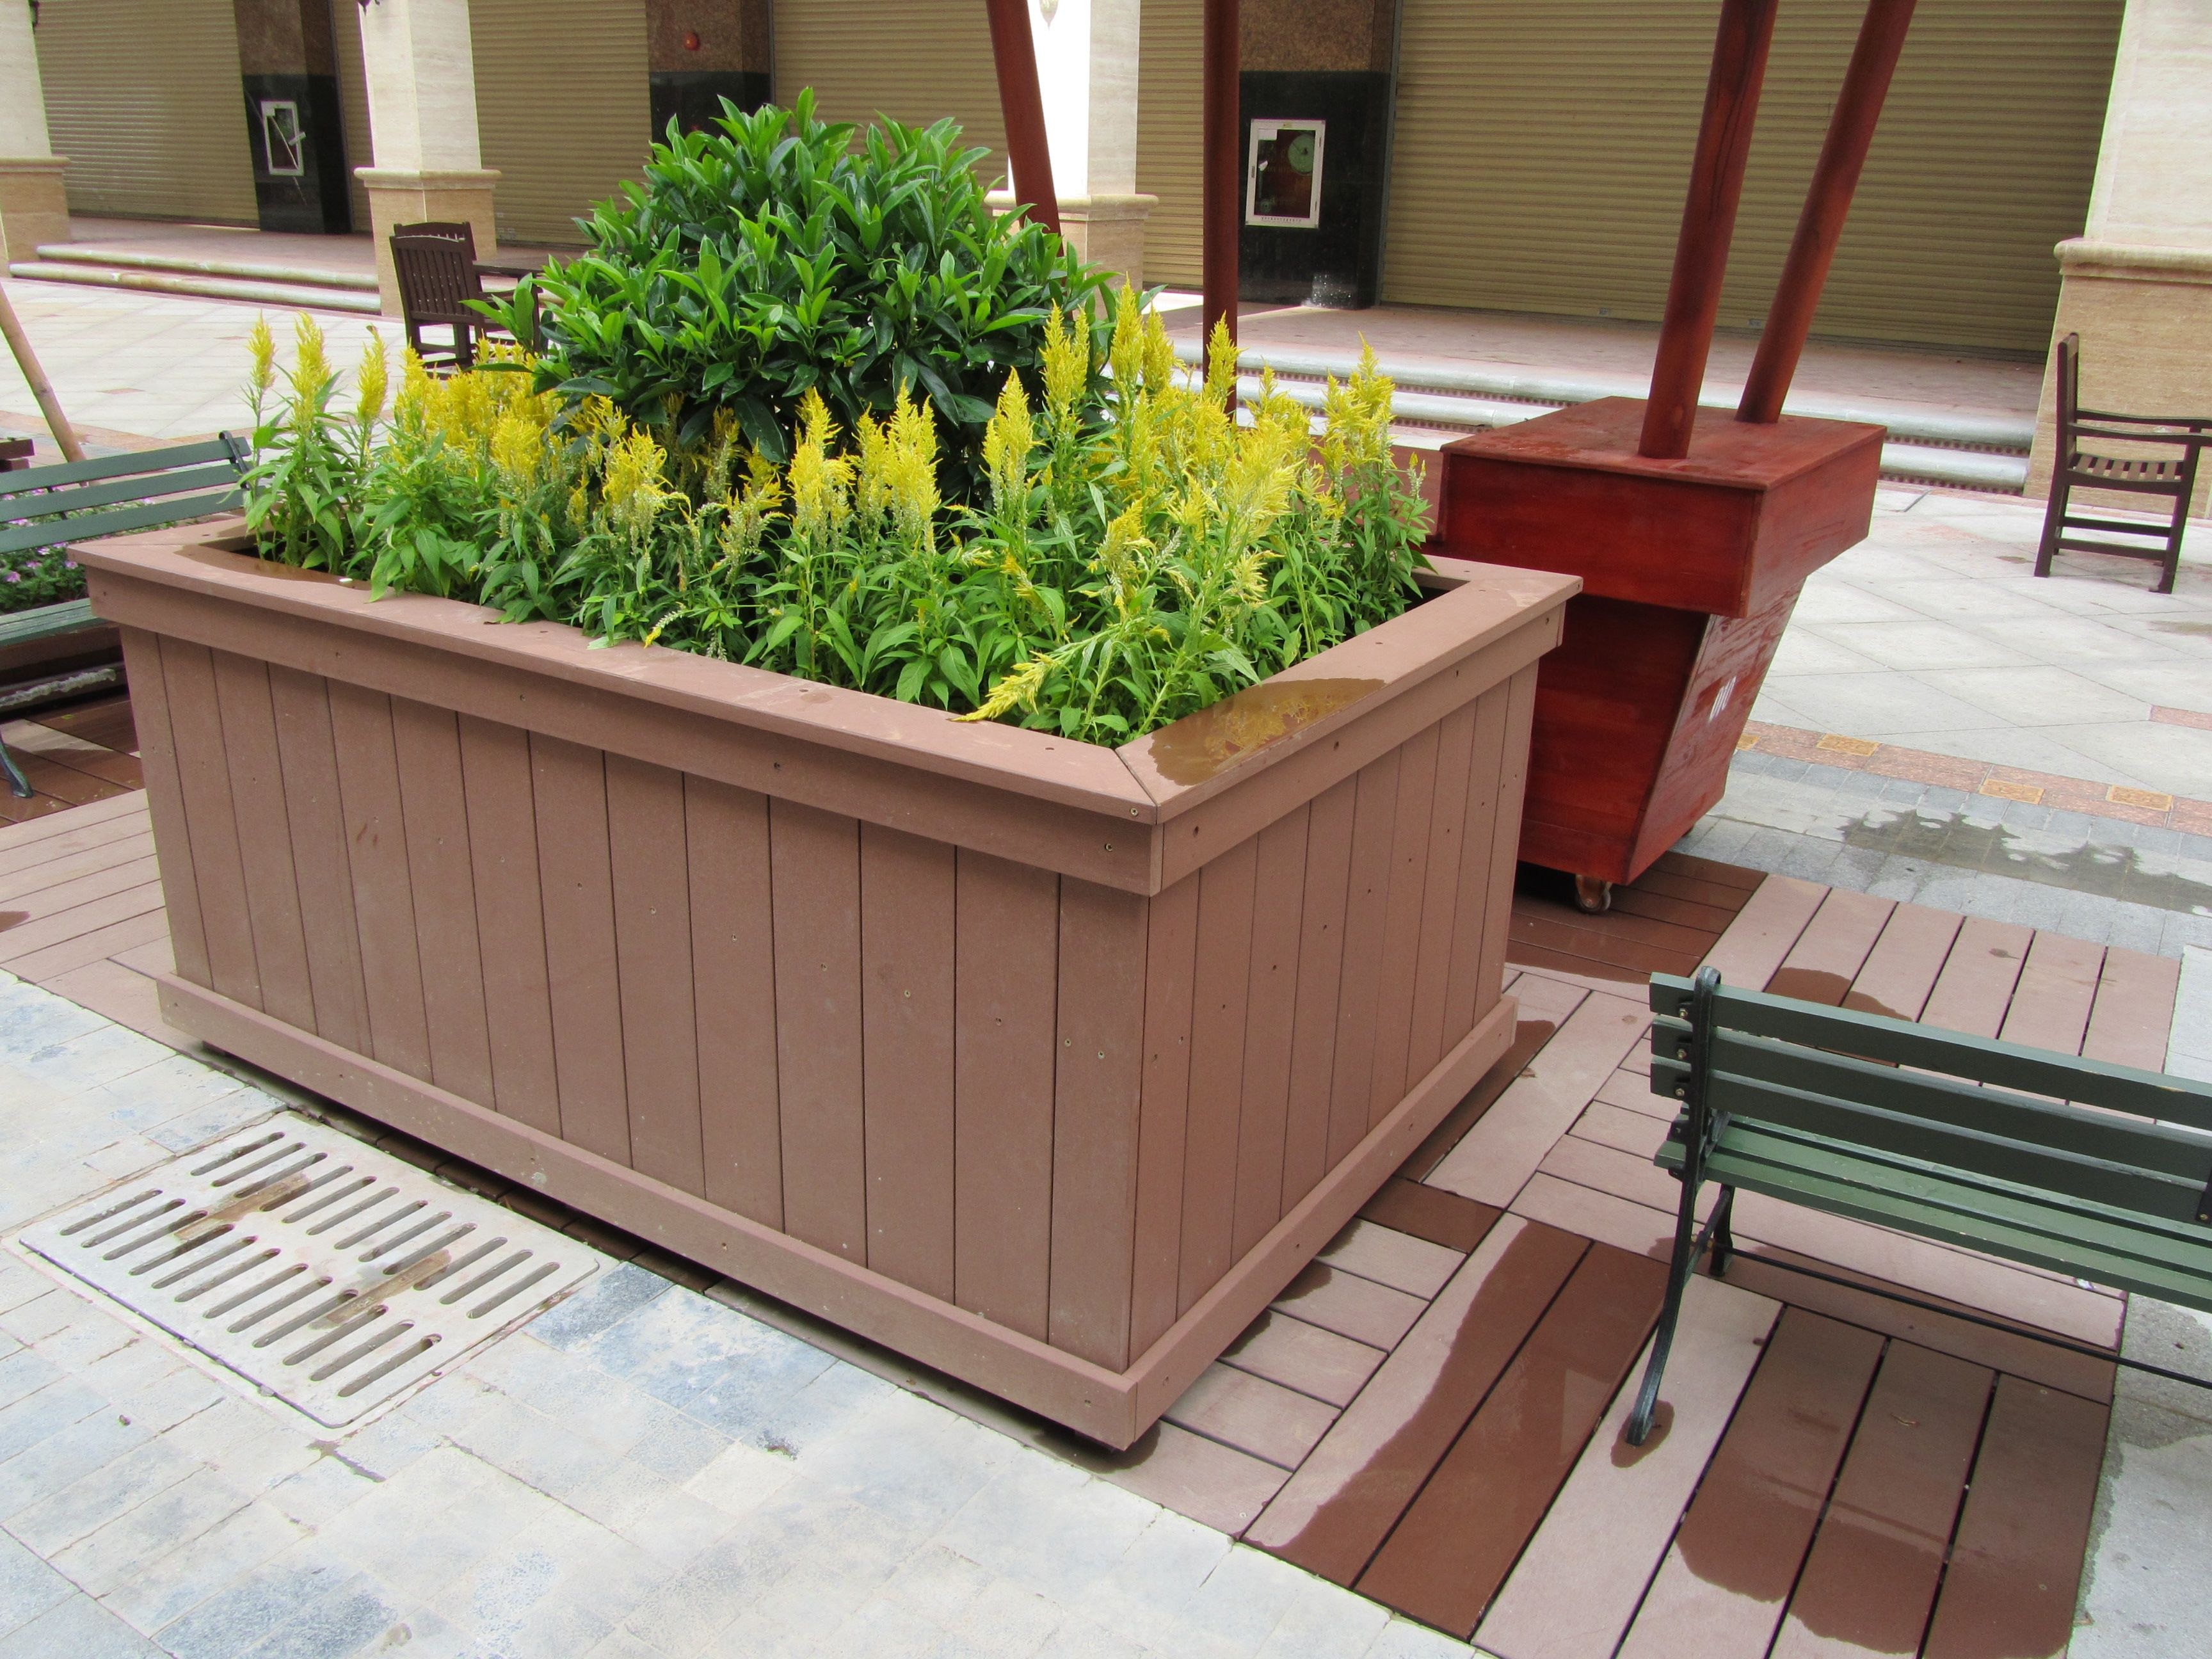 Non Absorbent Movable Flower Boxes Supplier #park #garden #plaza #flower # Box